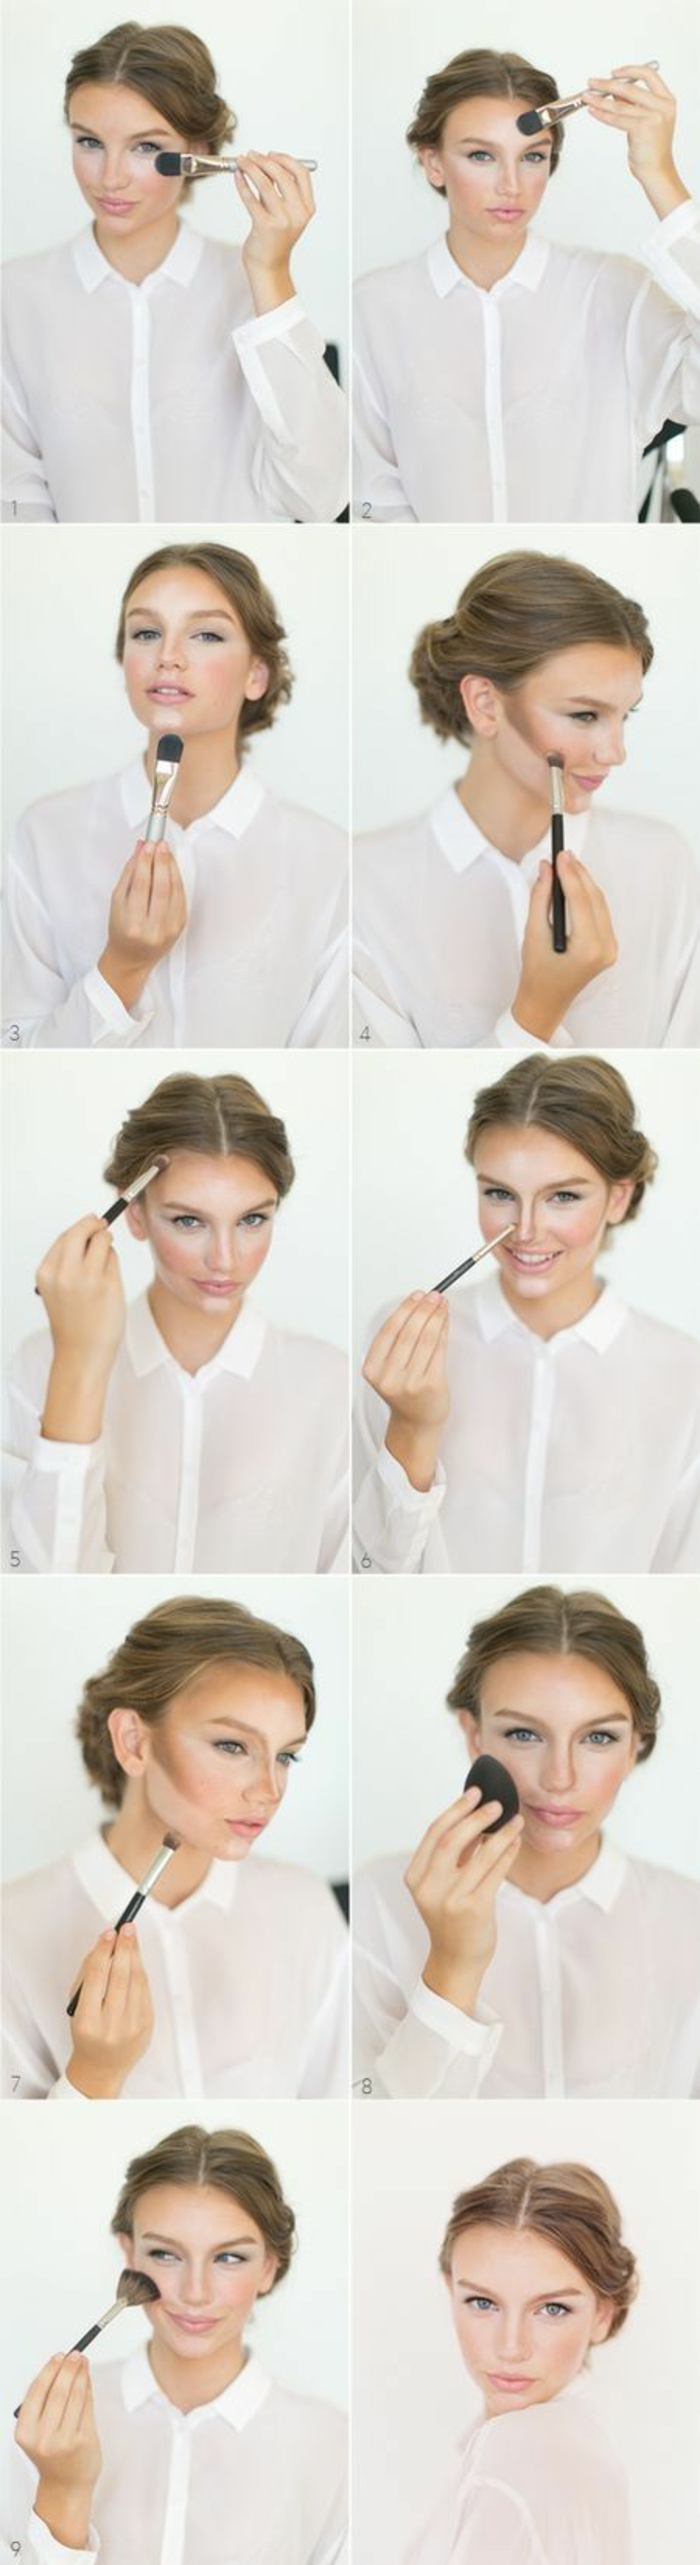 Etape du maquillage inspiration comment maquillage idee comment